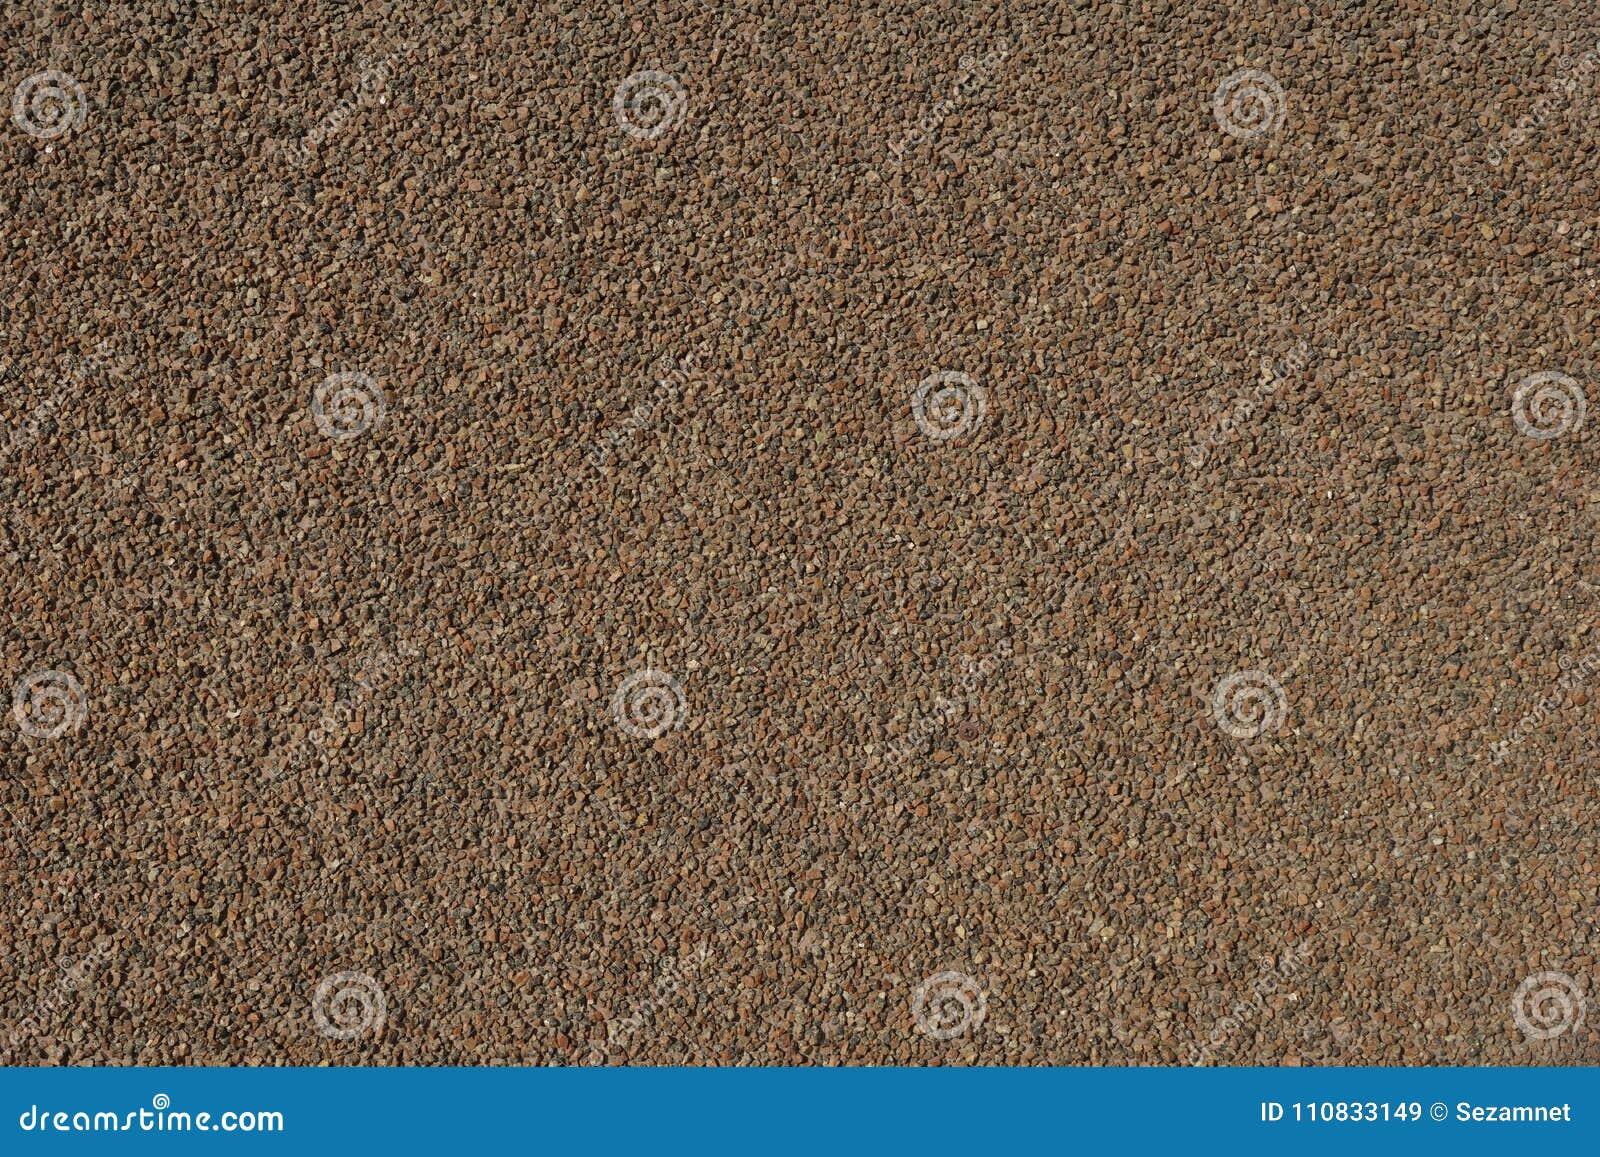 Eps 10 medf8ort granitsmula